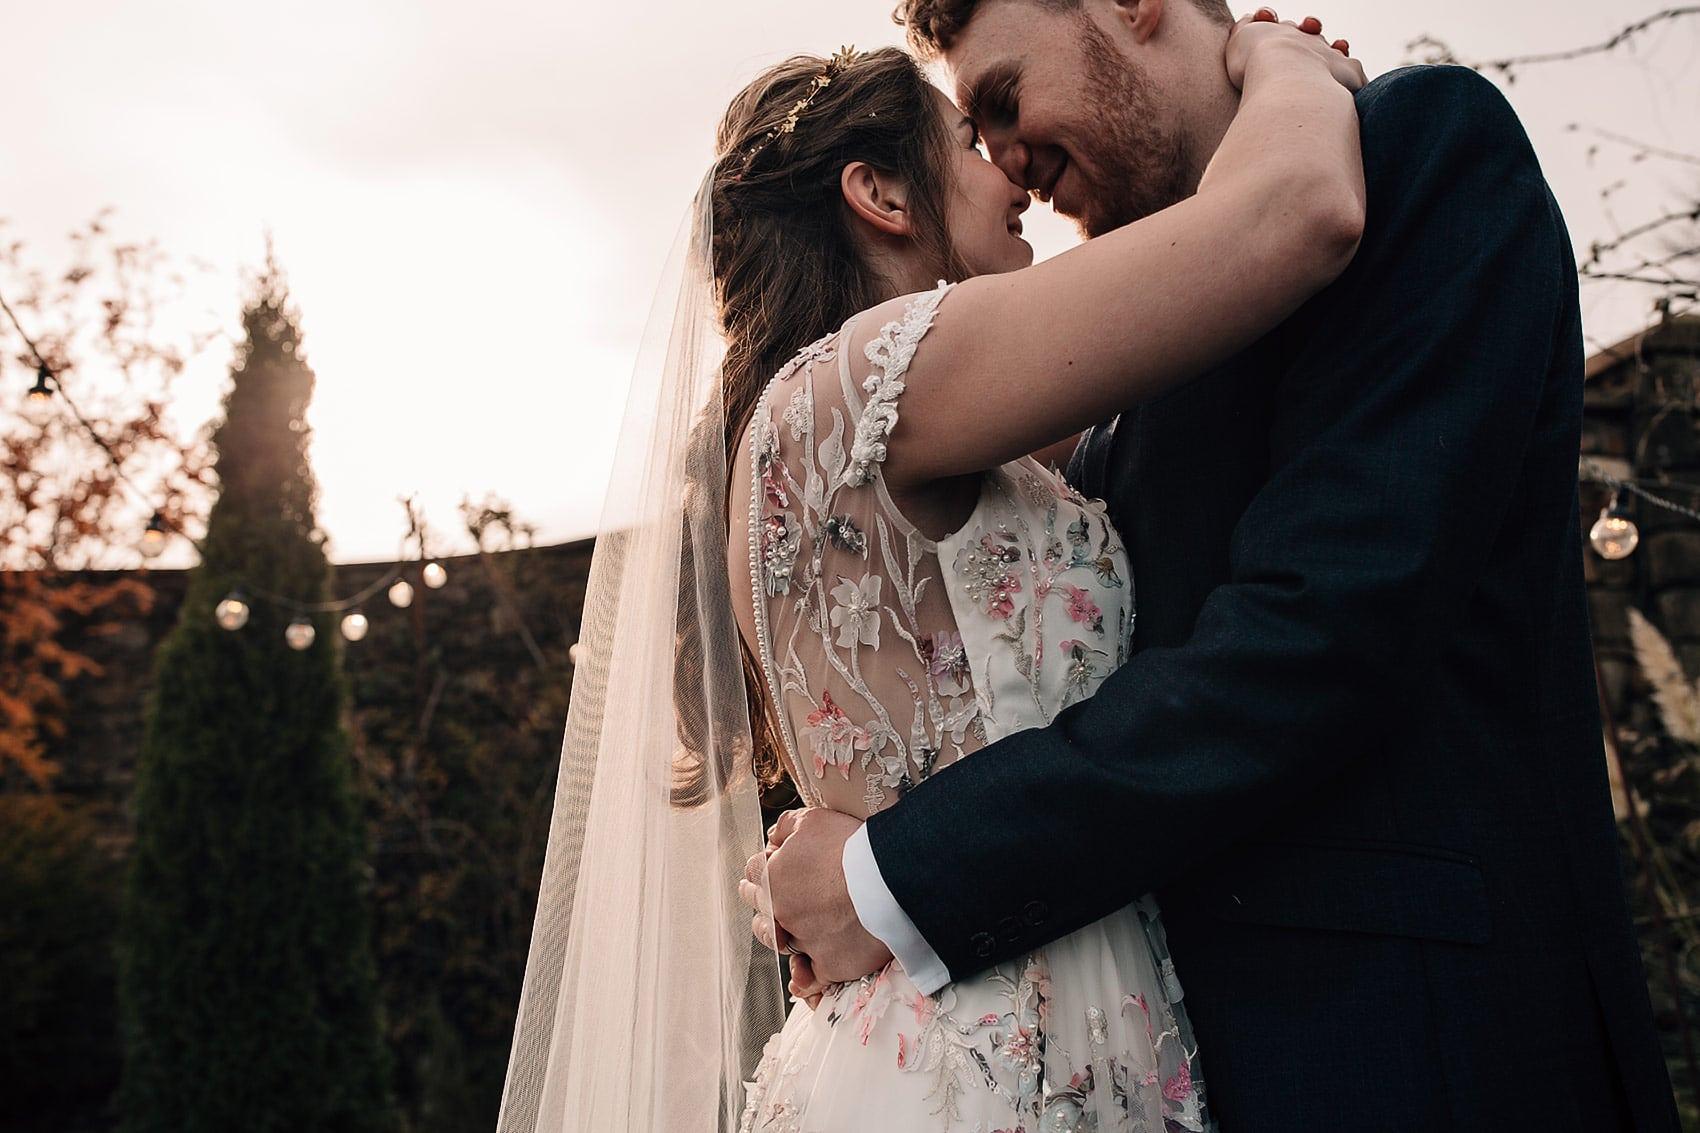 creative bride floral wedding dress inspiration